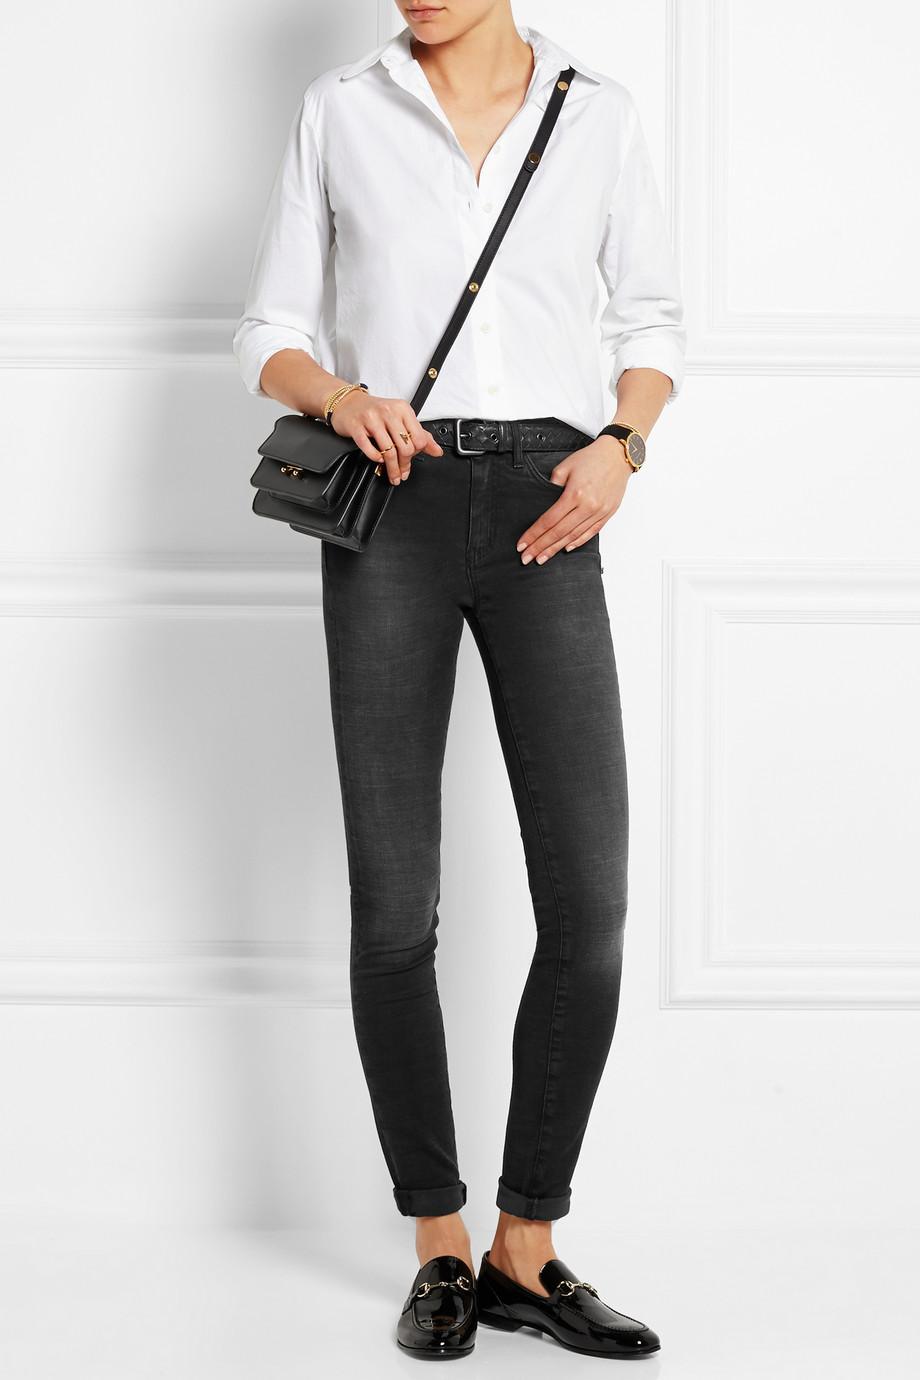 miH jeans white shirt 2015